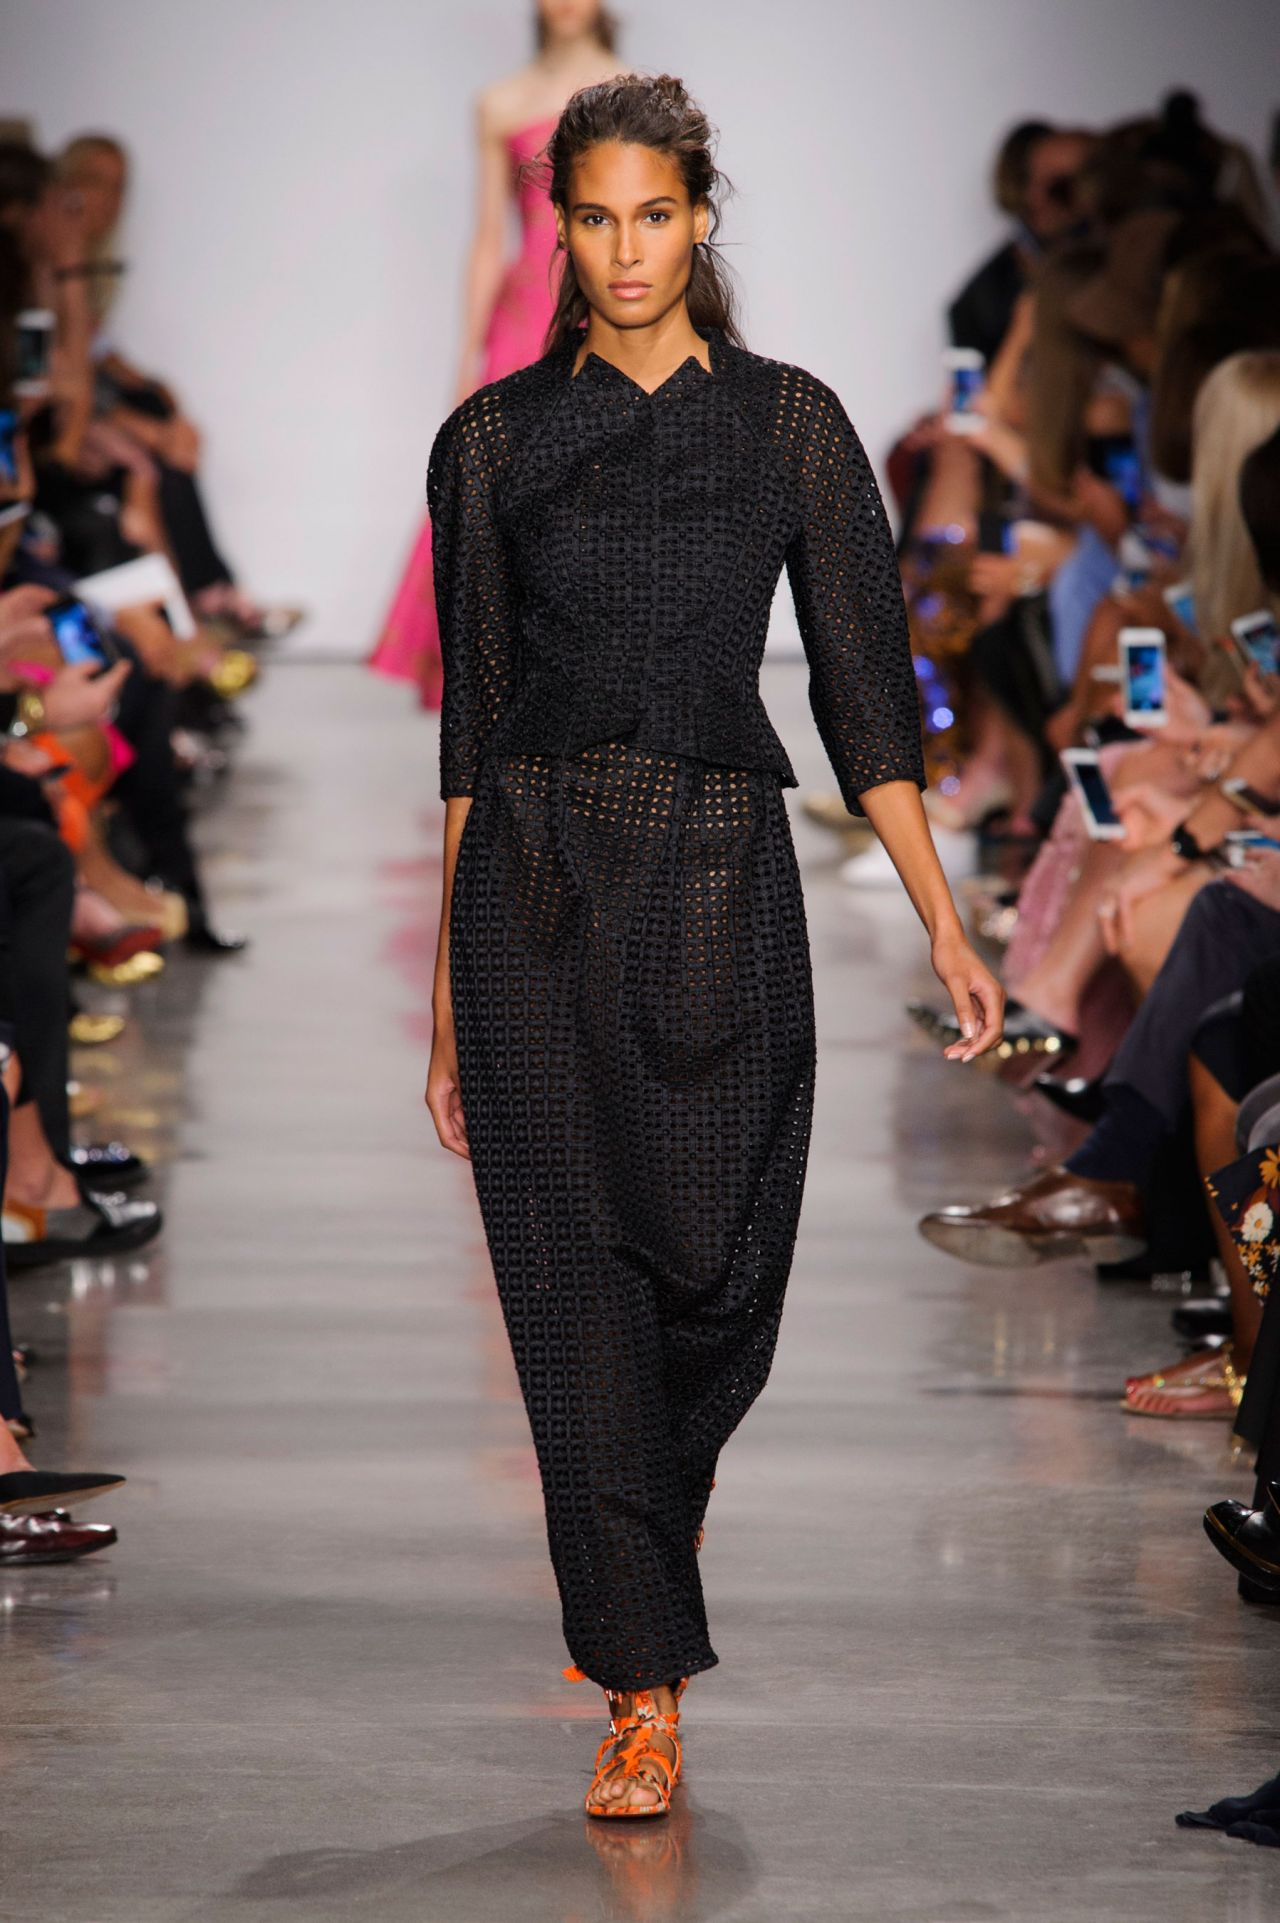 cindy bruna zac posen show at milan fashion week september 2016. Black Bedroom Furniture Sets. Home Design Ideas